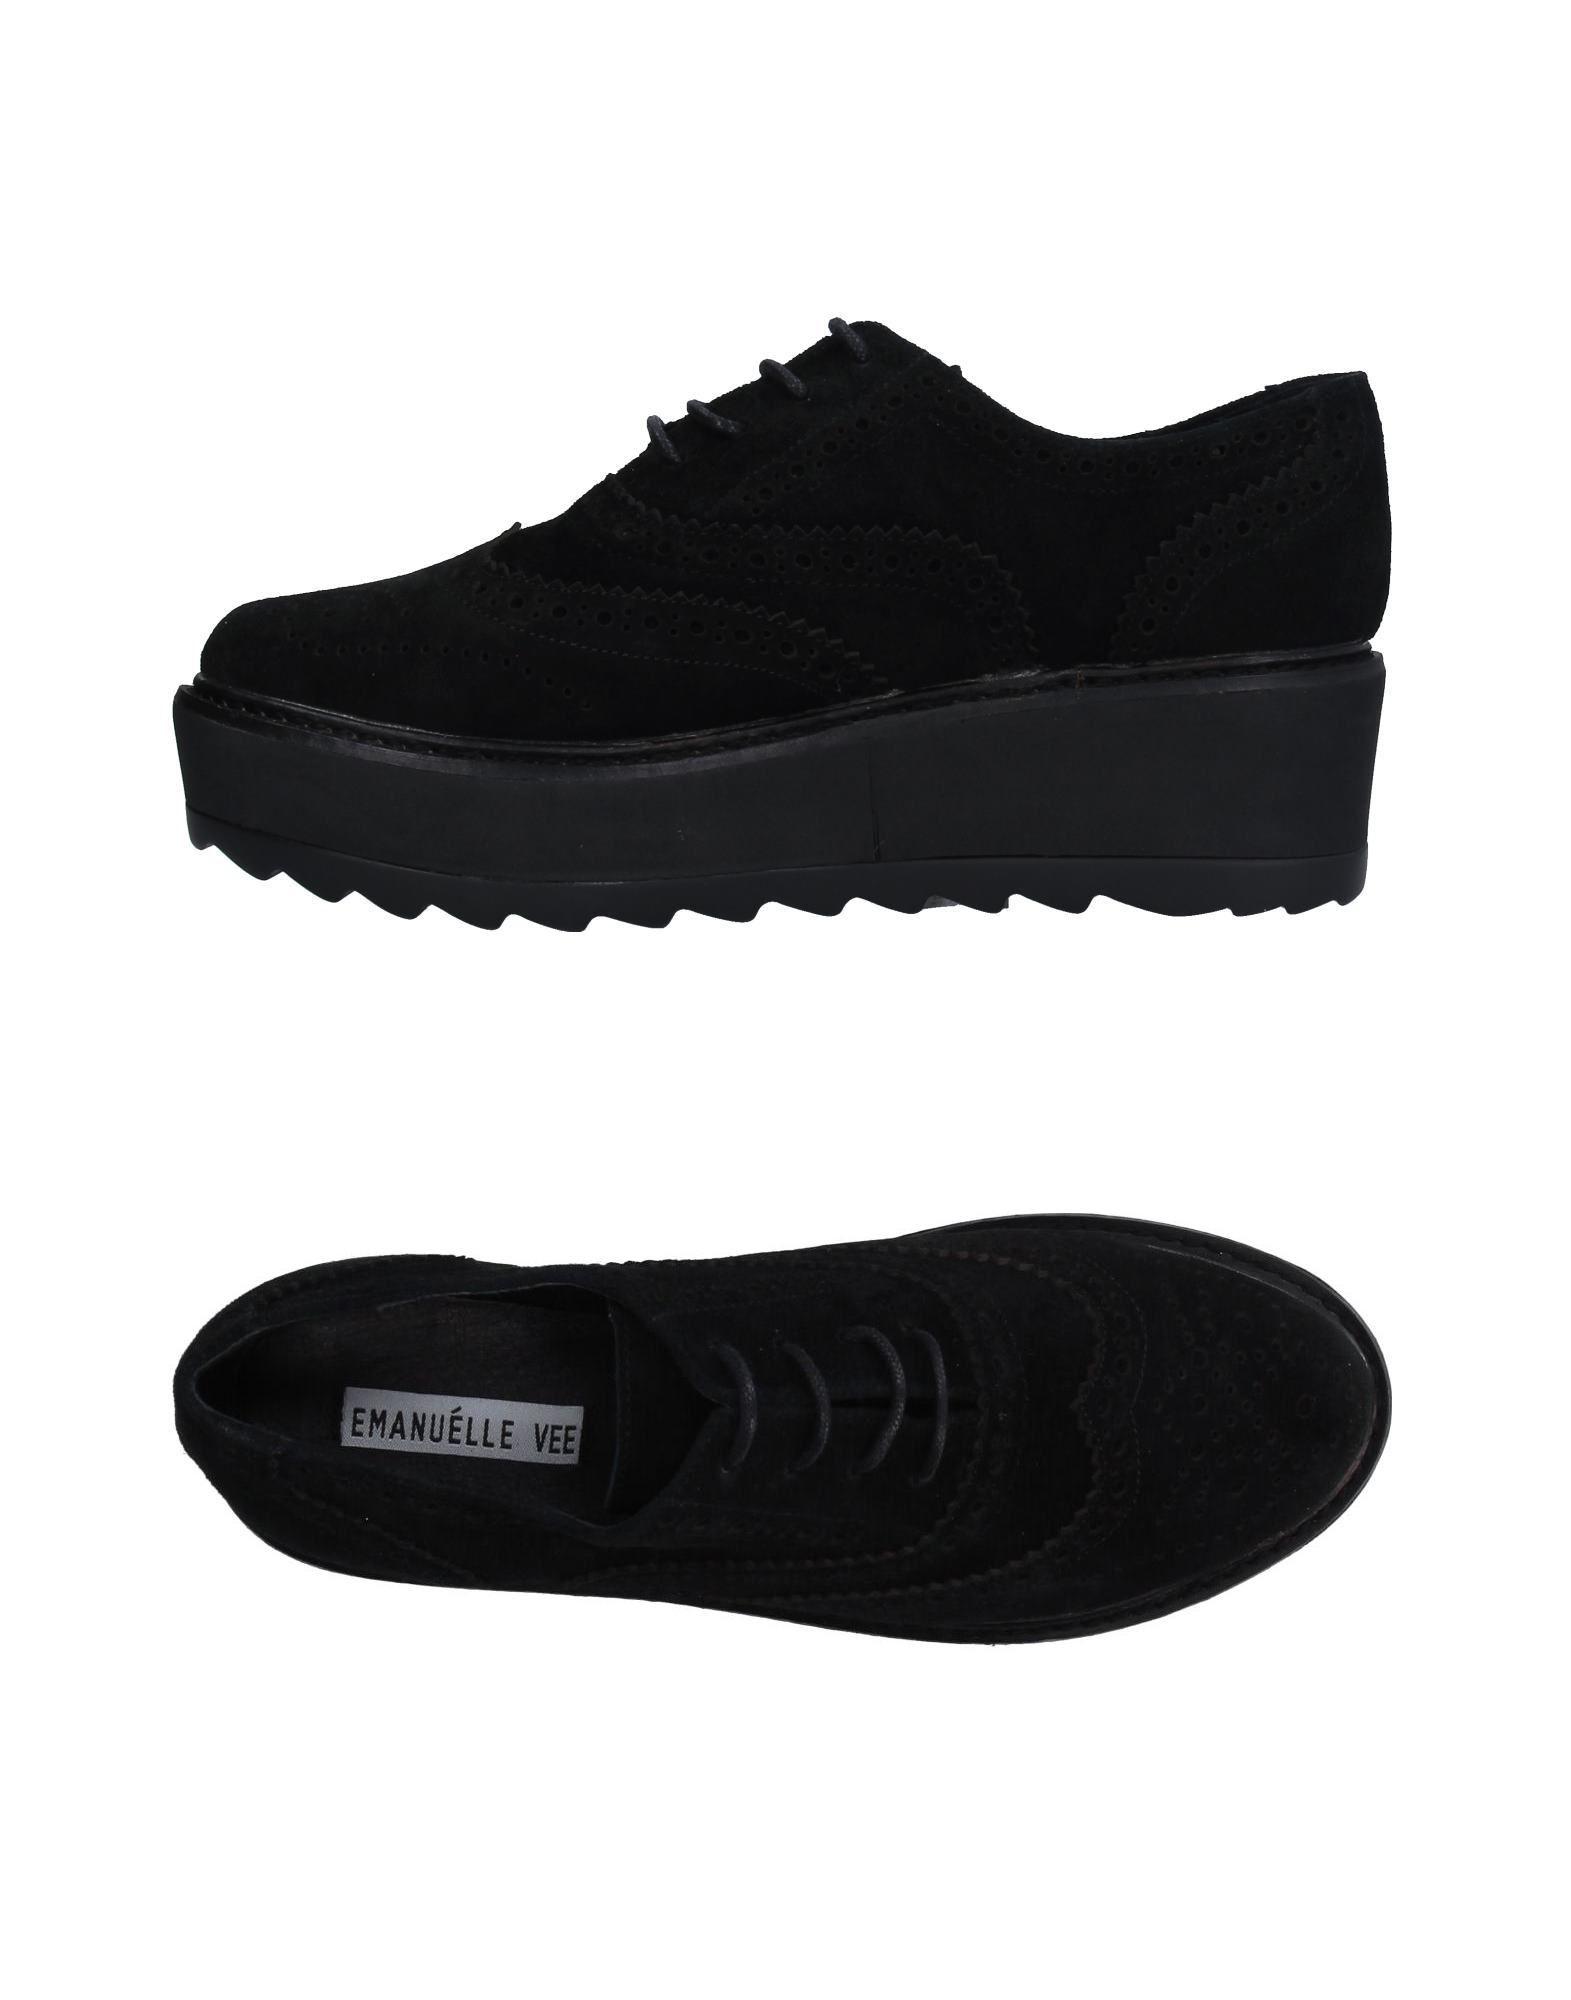 Emanuélle 11241127QM Vee Schnürschuhe Damen  11241127QM Emanuélle Gute Qualität beliebte Schuhe 93a782